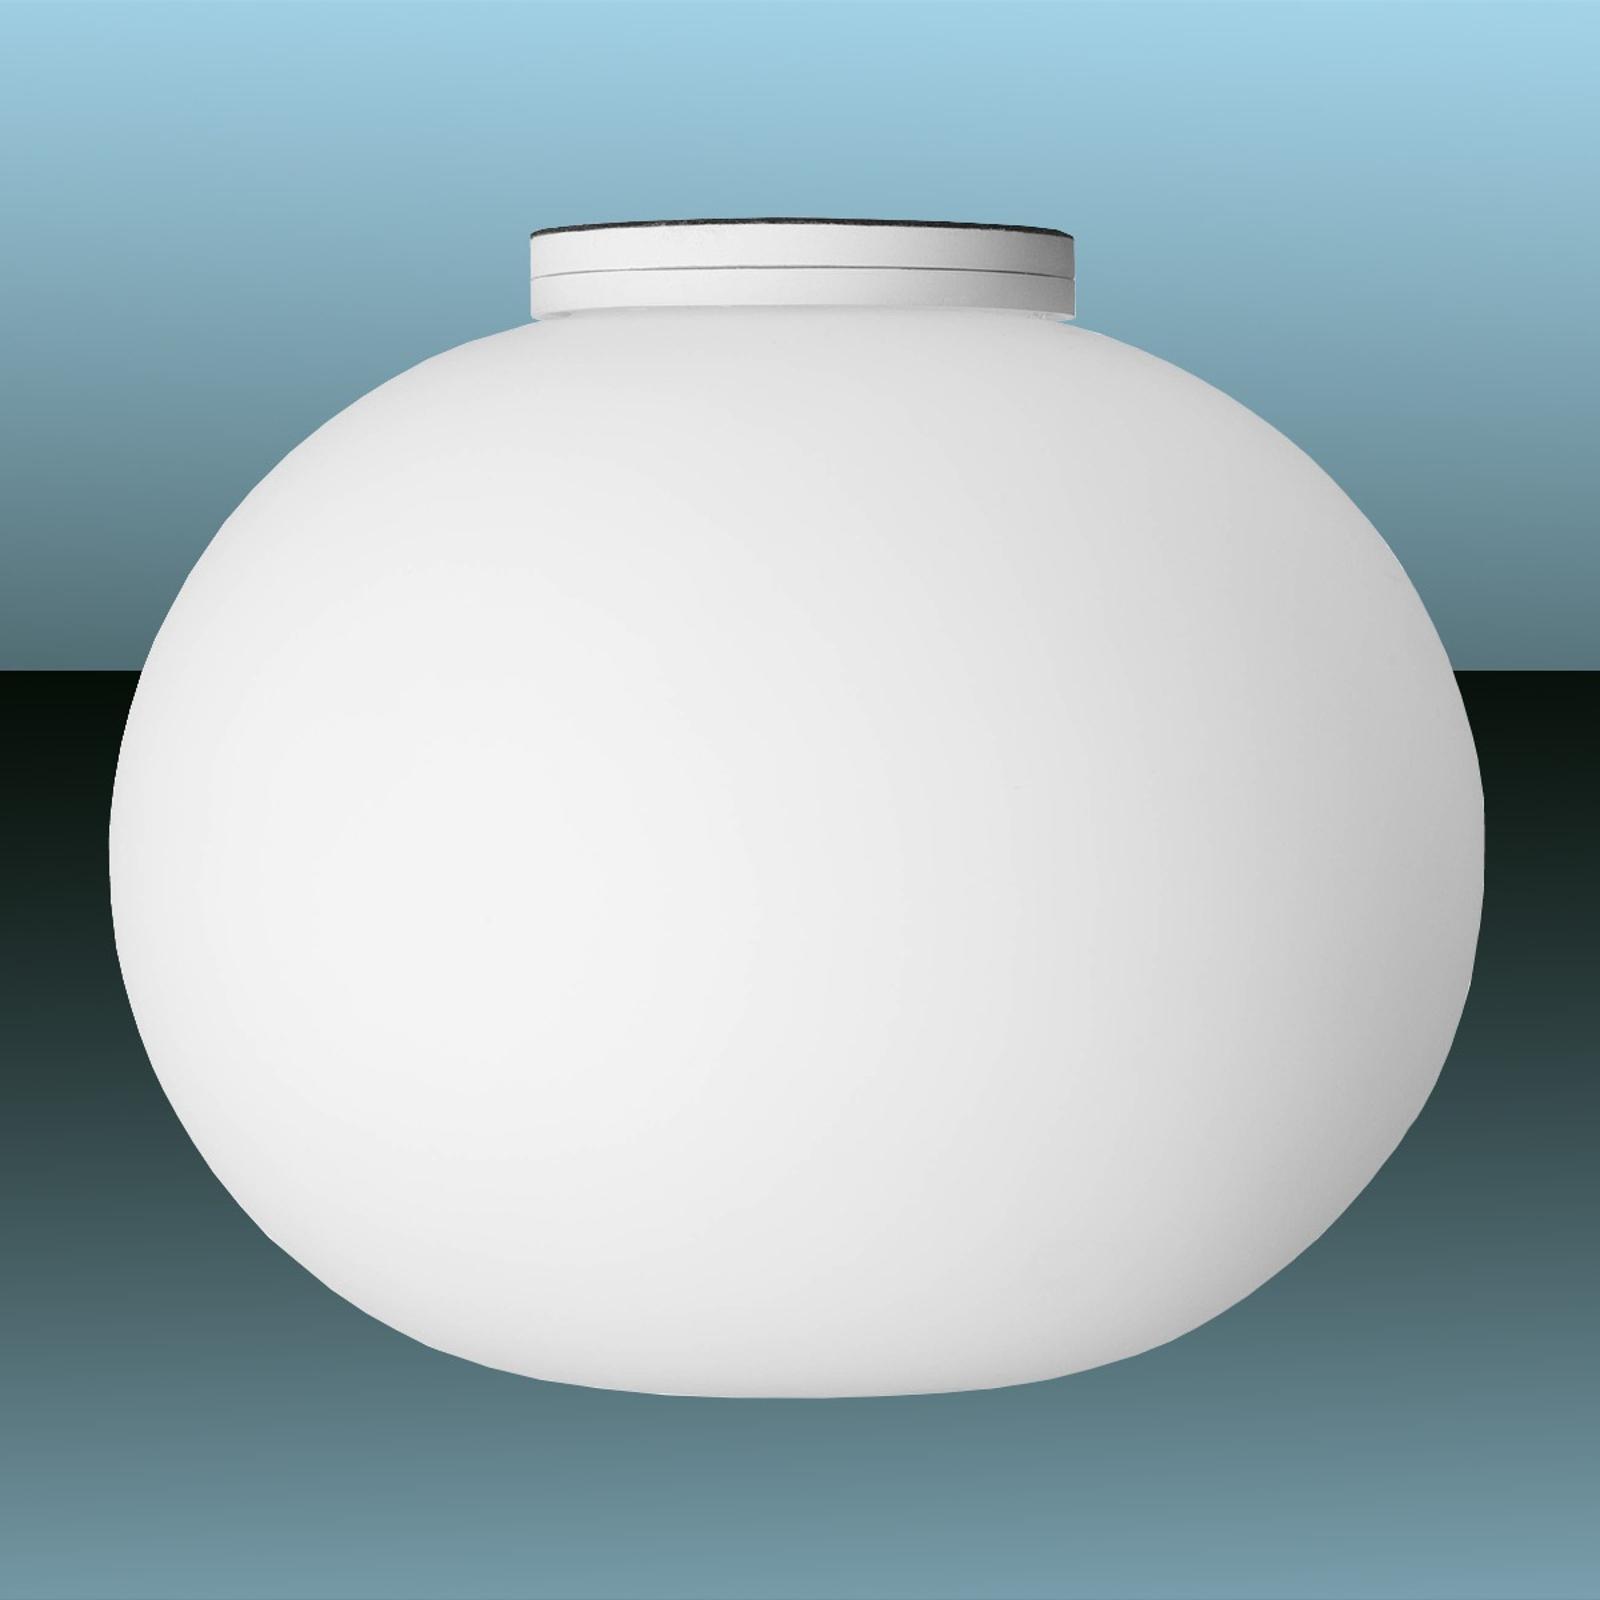 Glob-Ball Basic Zero - subtil taklampe